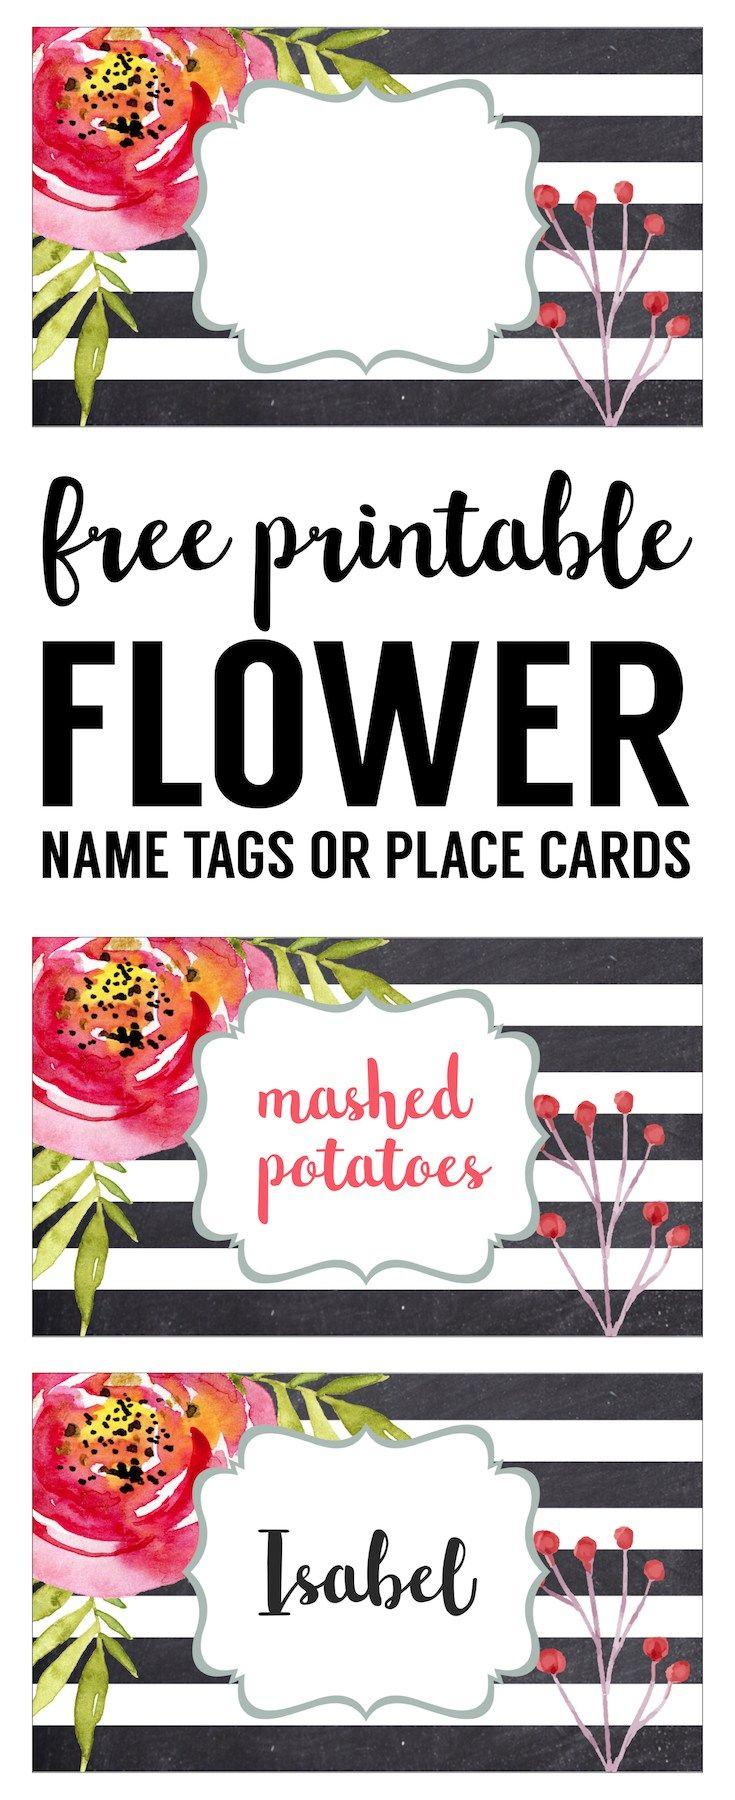 Flower place card holder or food labels free printable flower flower place card holder or food labels free printable bookmarktalkfo Image collections